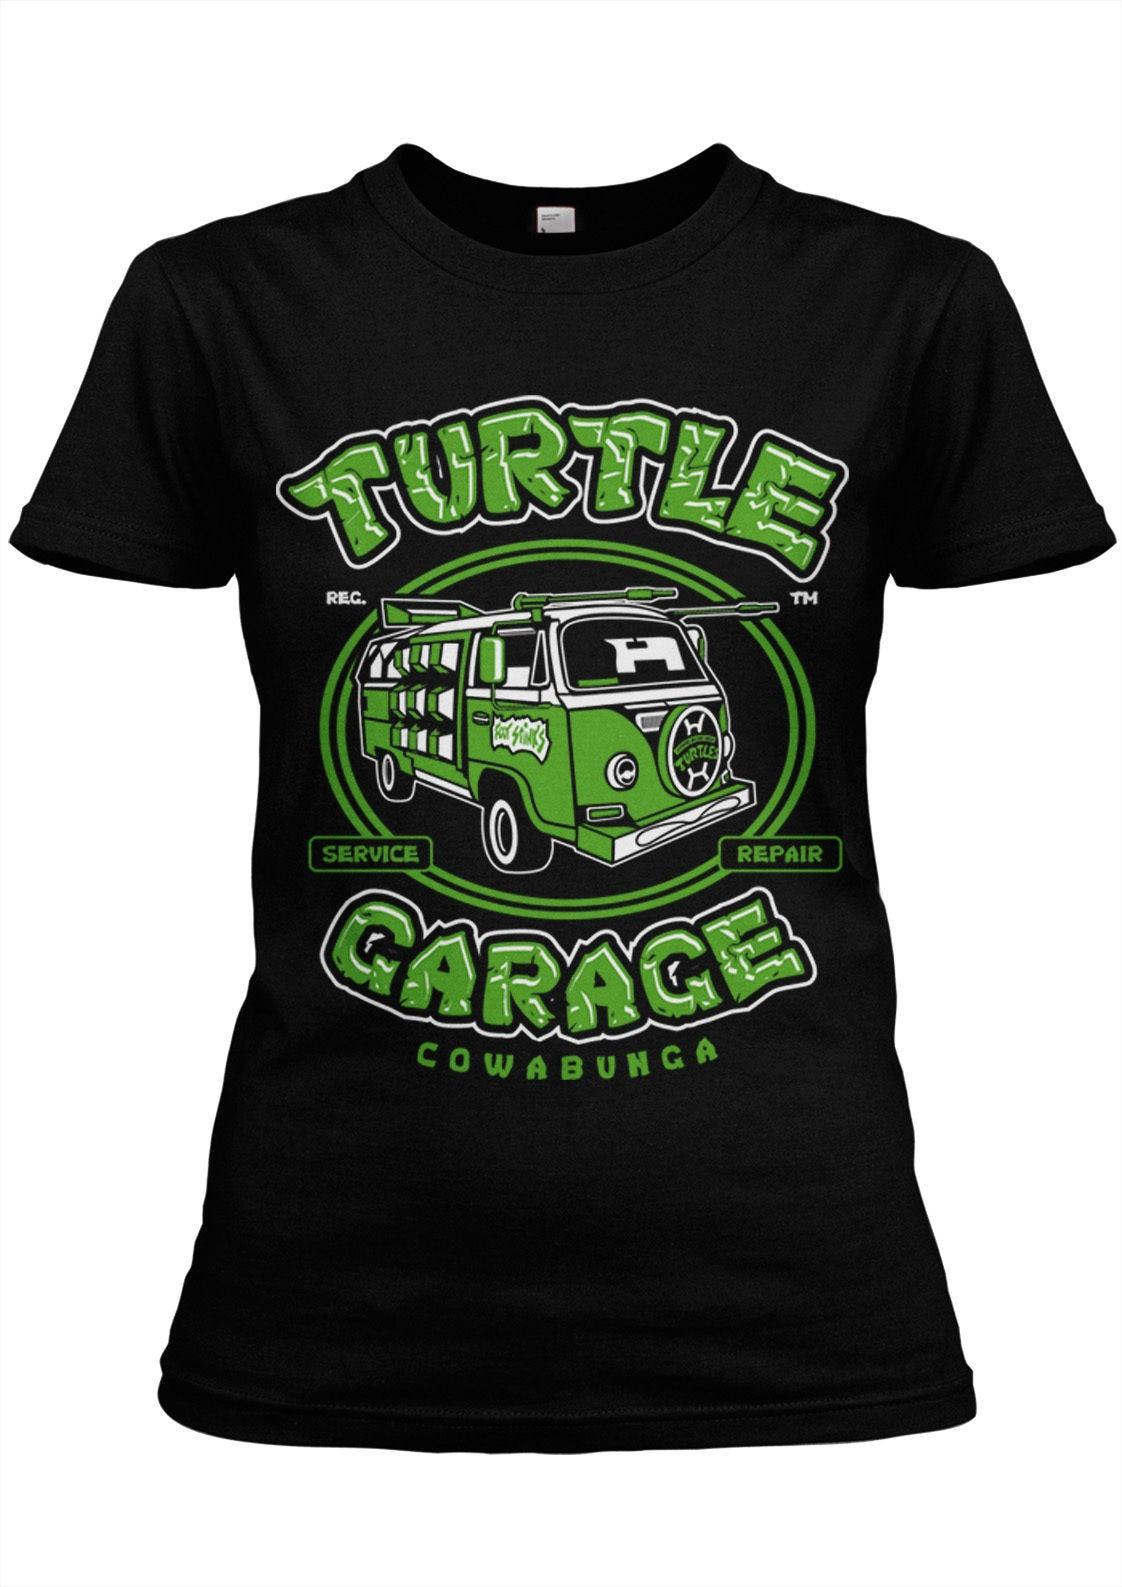 Fashion Summer Short Sleeve Tee Shirt Turtles Garage Girlie T-Shirt Ninja,Foot Soldiers,Shredder,TMNT,Master Splinter